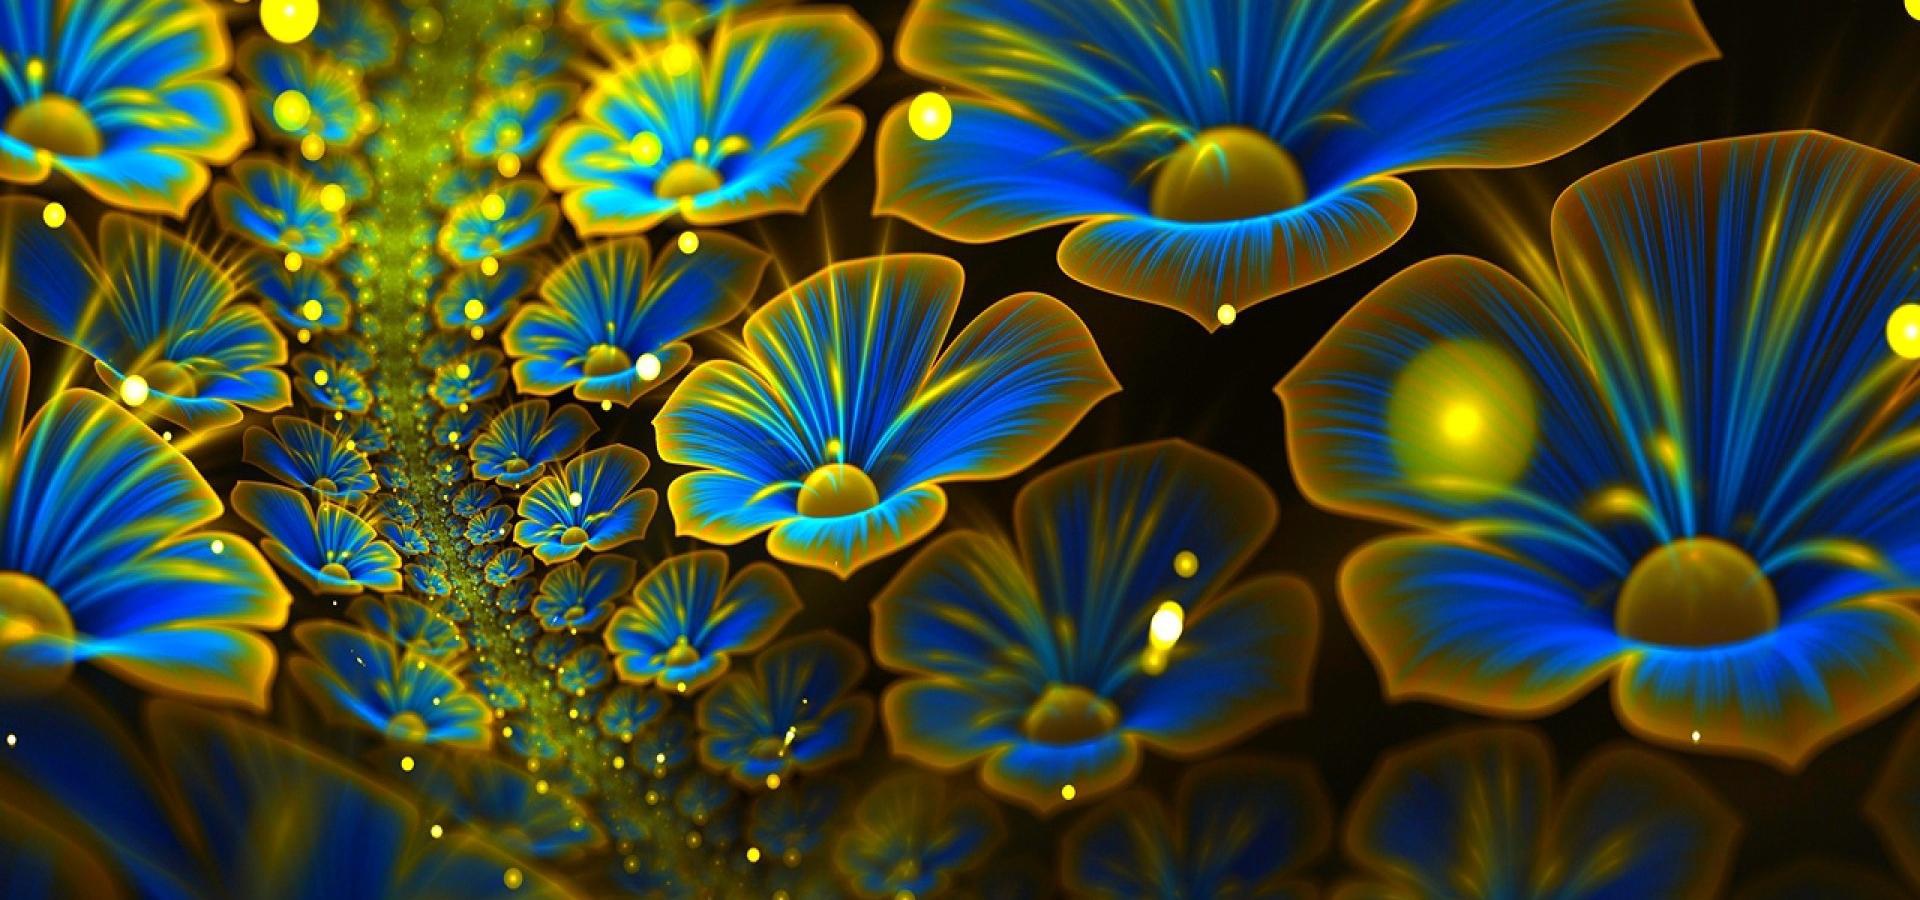 Diseño Arte Patrón Fondos De Pantalla Antecedentes: Patrón Fondos De Pantalla Arte Floral Antecedentes